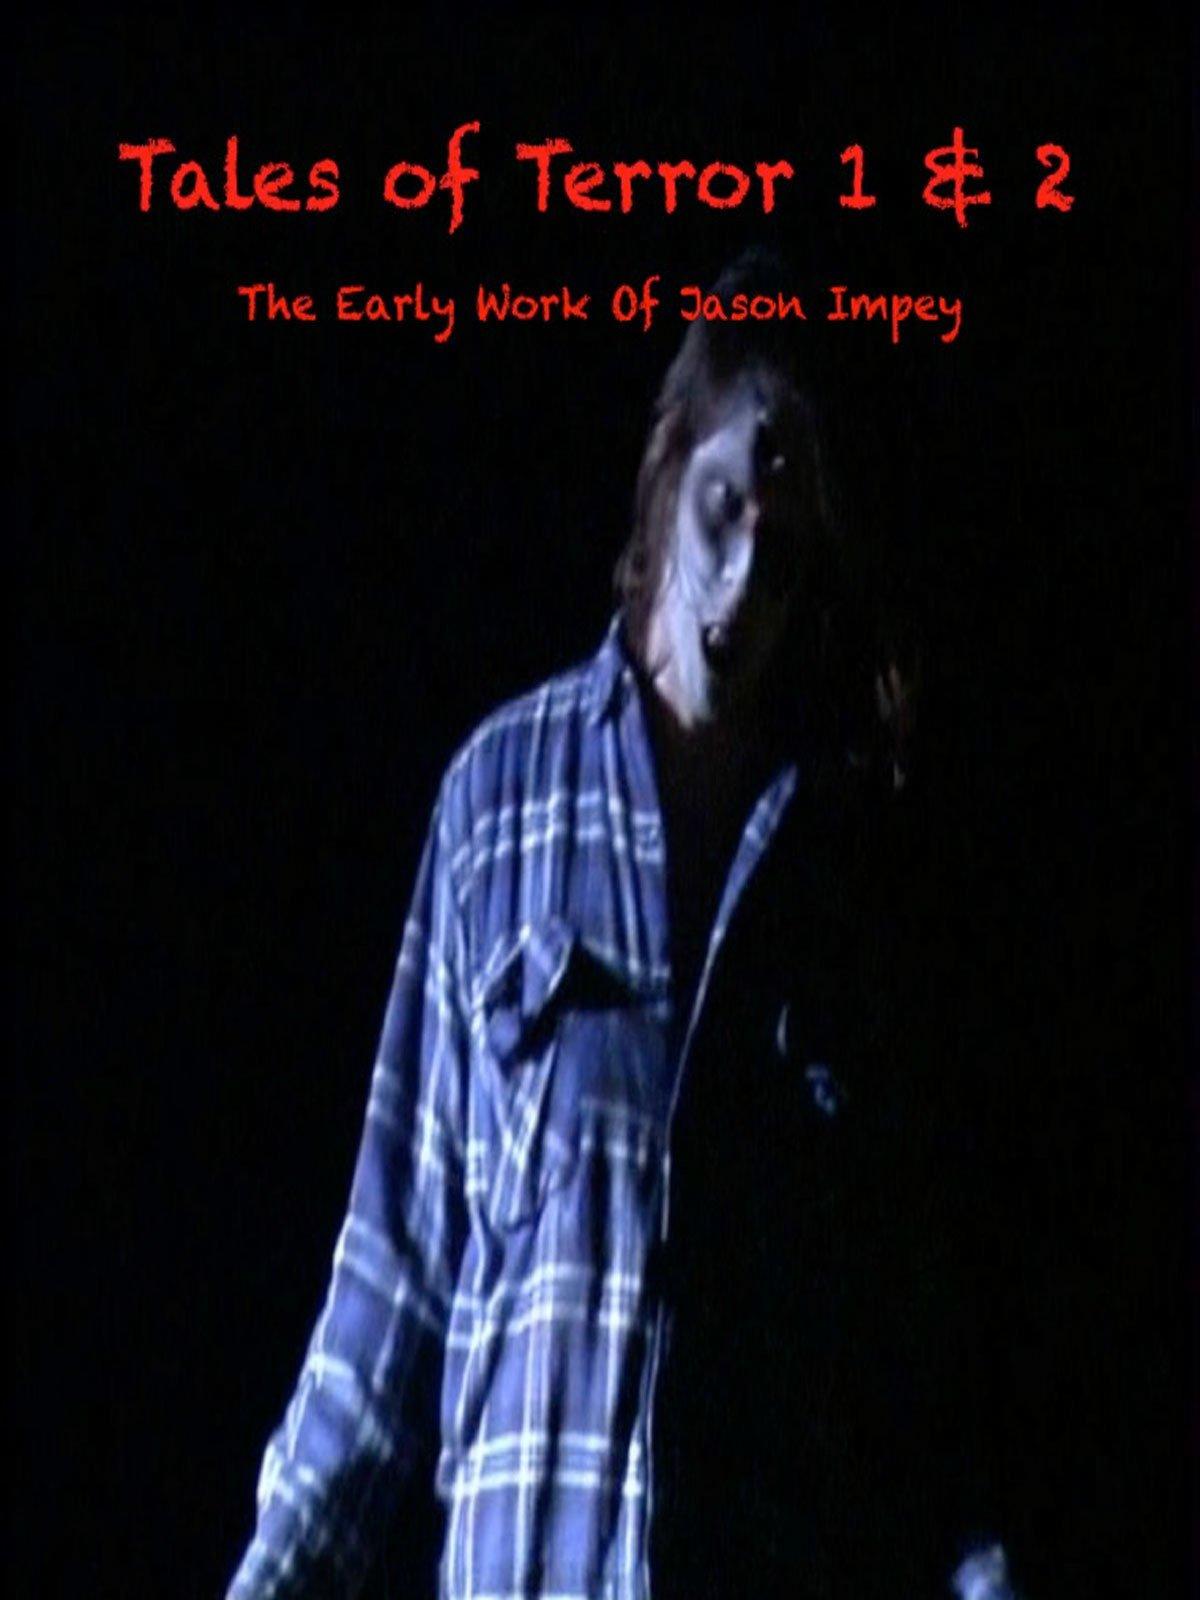 Tales of Terror 1 & 2